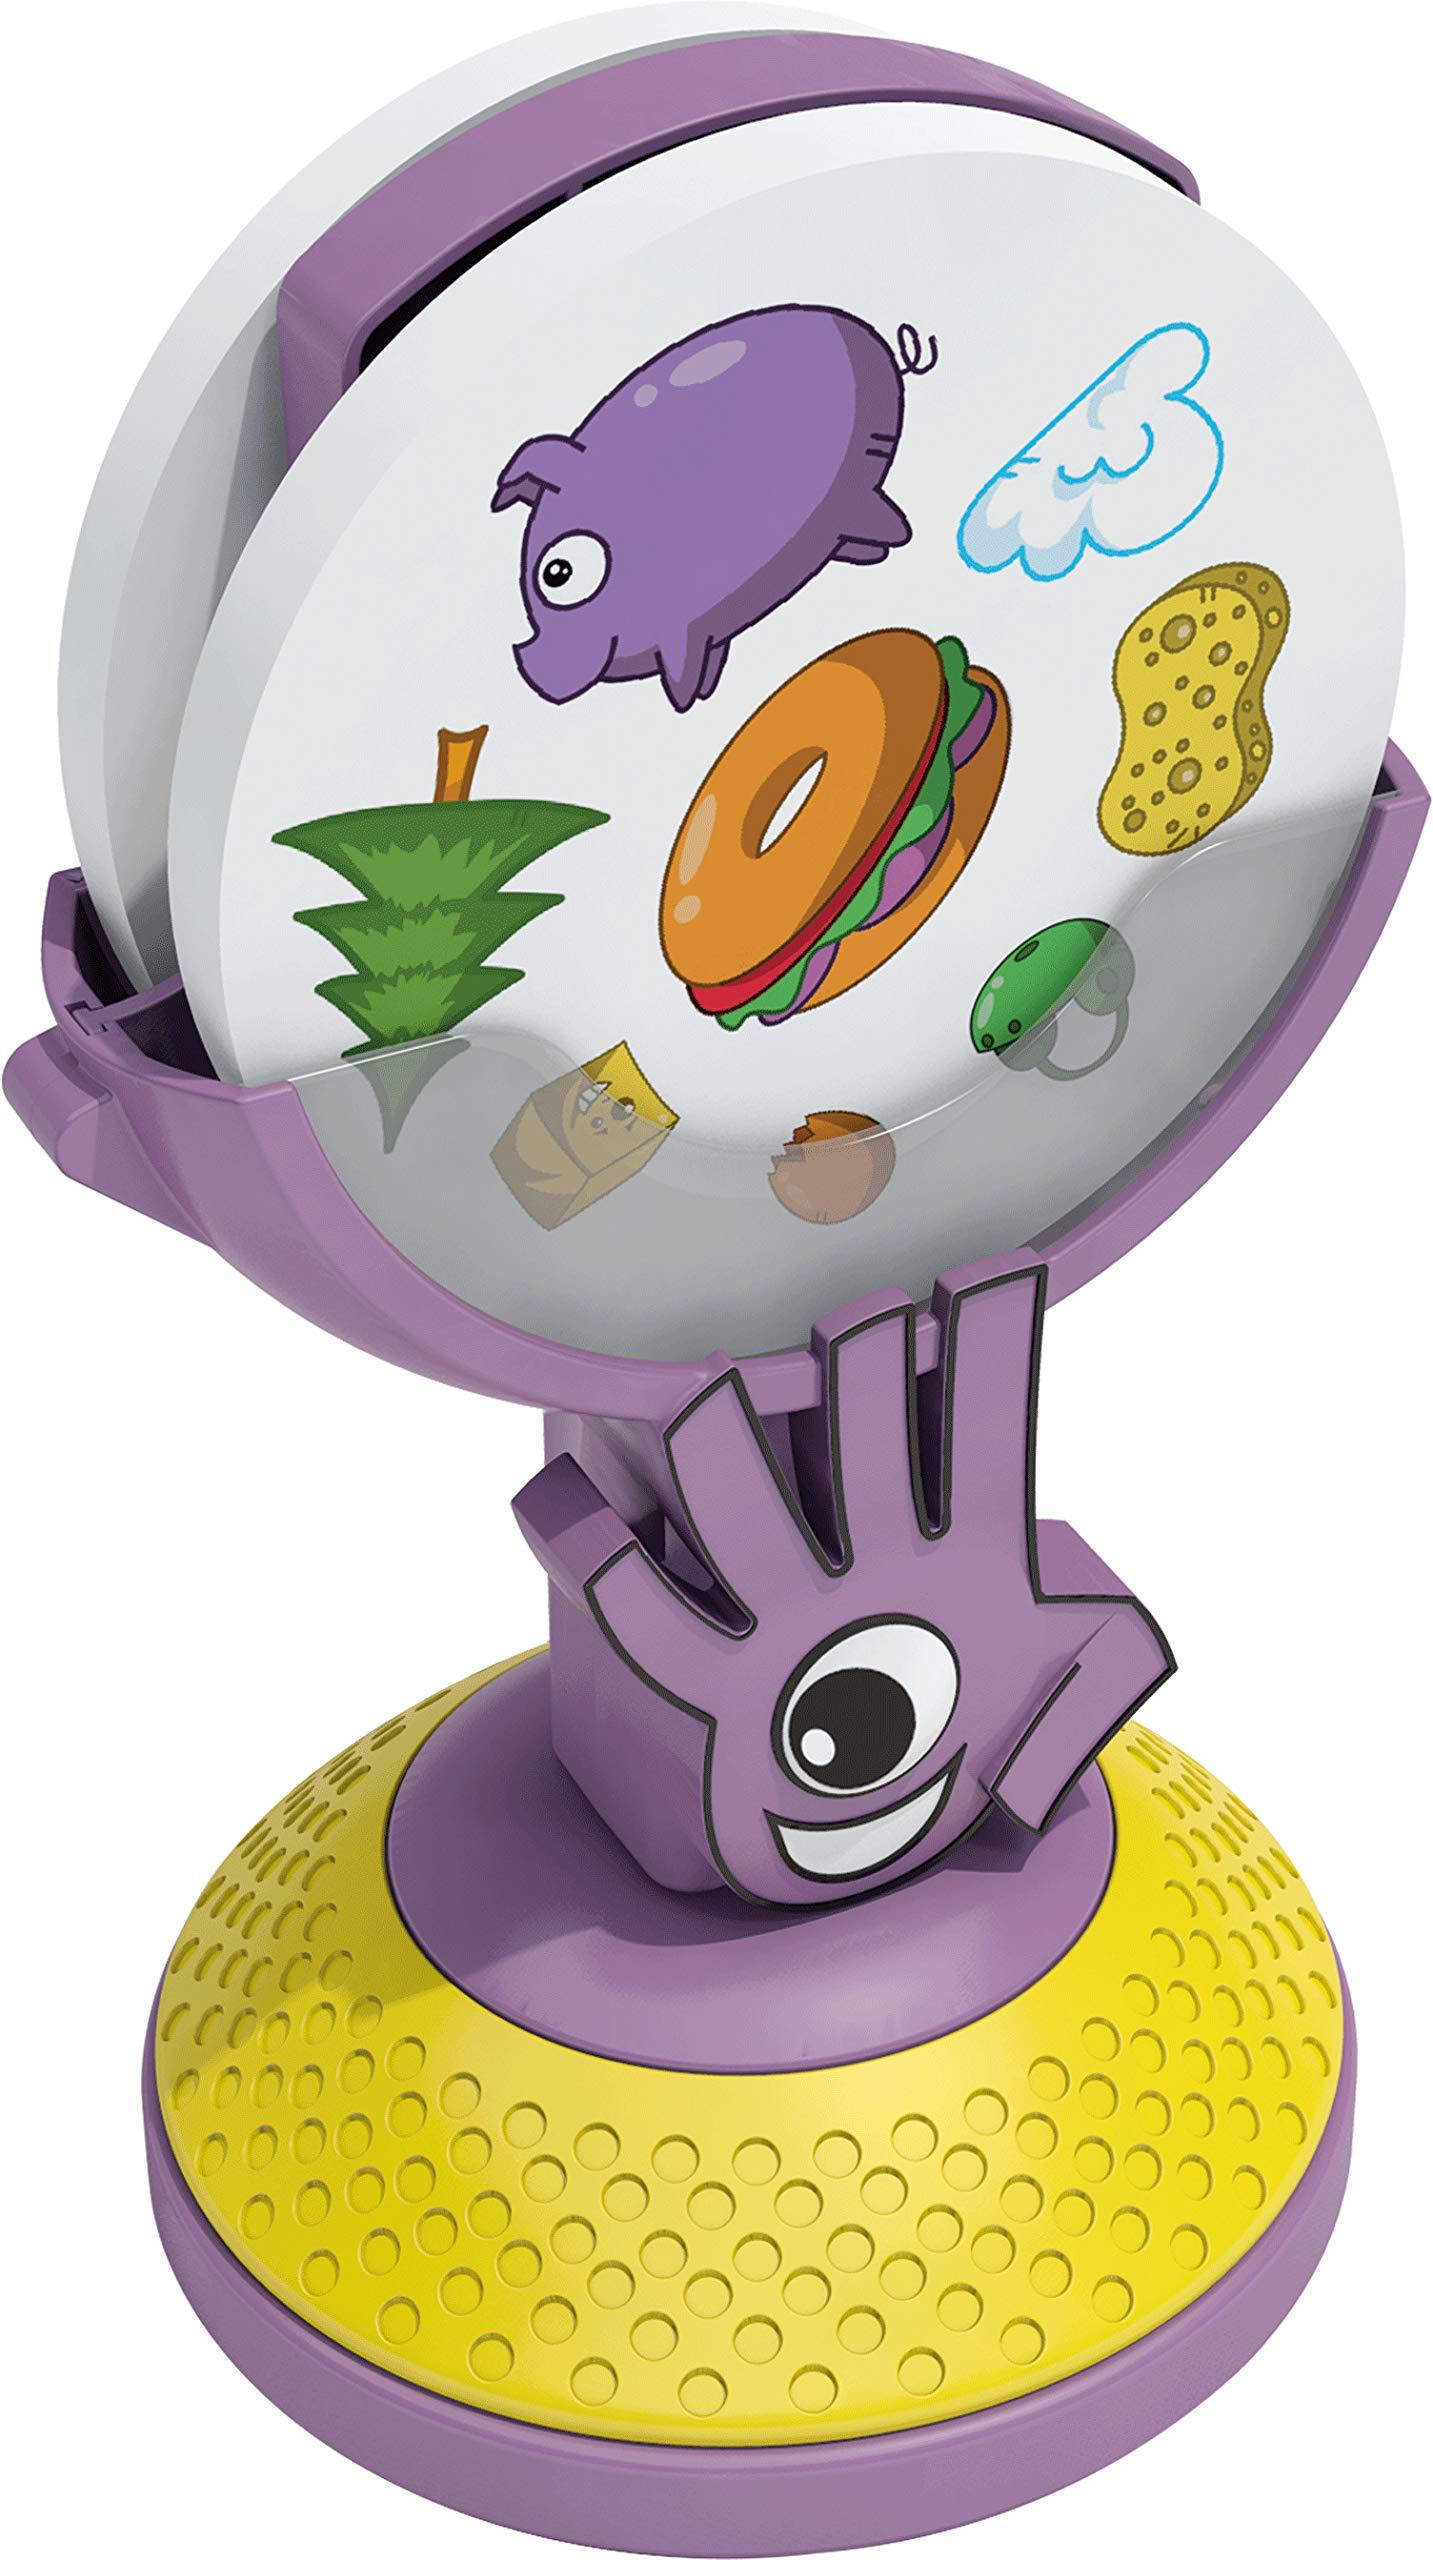 Asmodee- Dobble 360°, DOBB360FR, Jeu Dambiance: Amazon.es: Juguetes y juegos